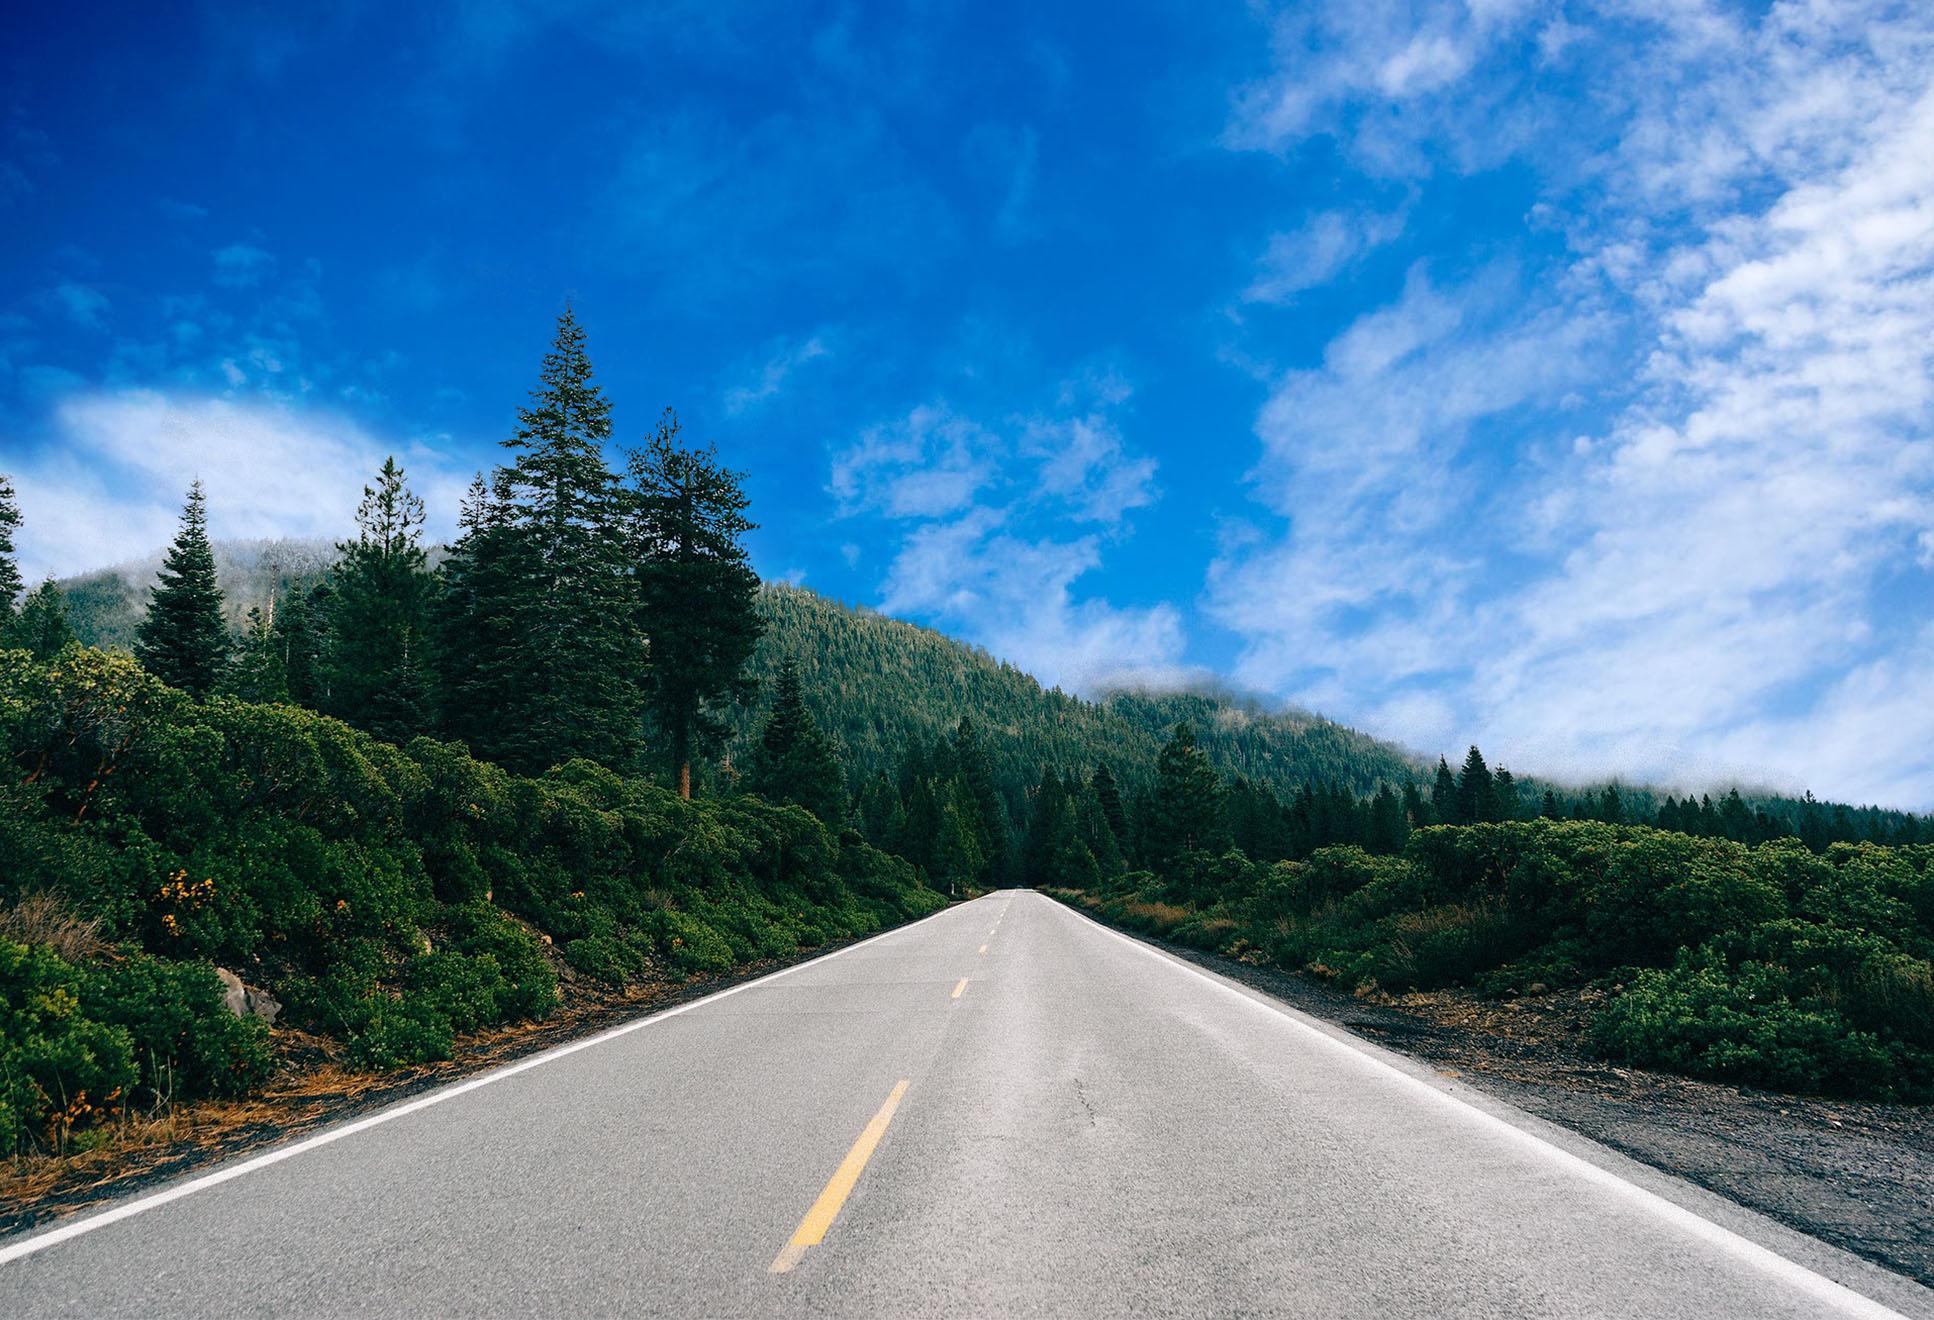 Road_13